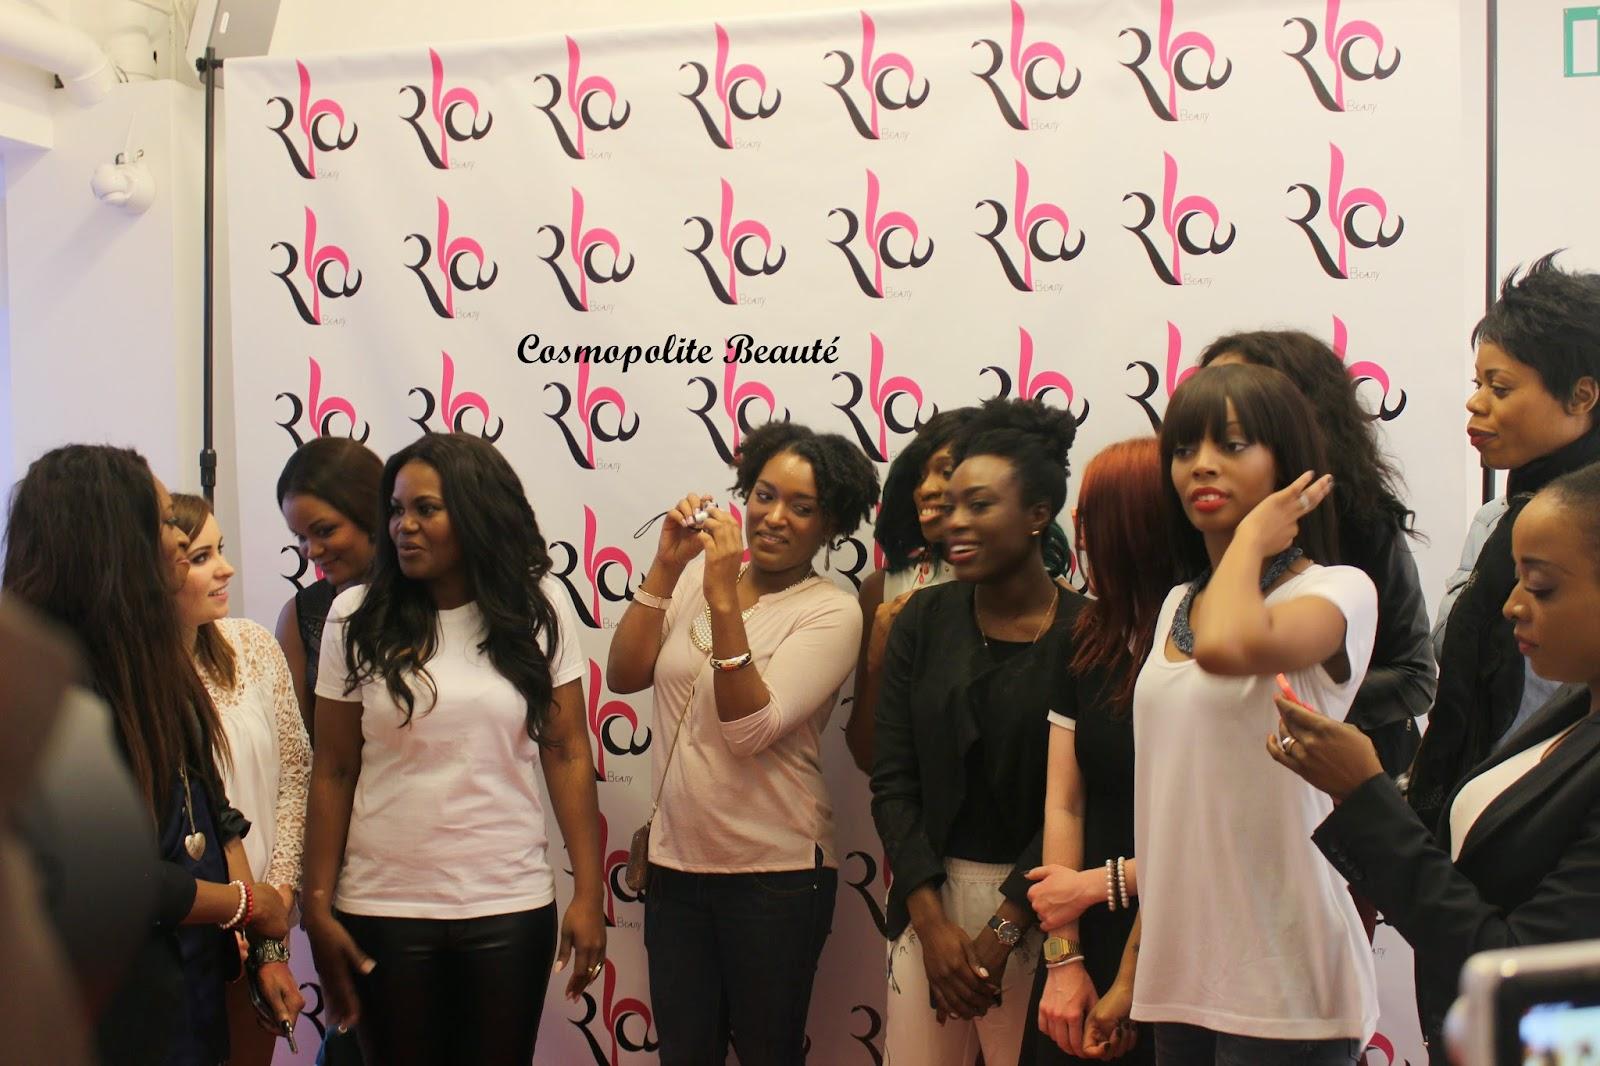 rya beauty, rencontre youtubeuses, salon beauté, beauty event